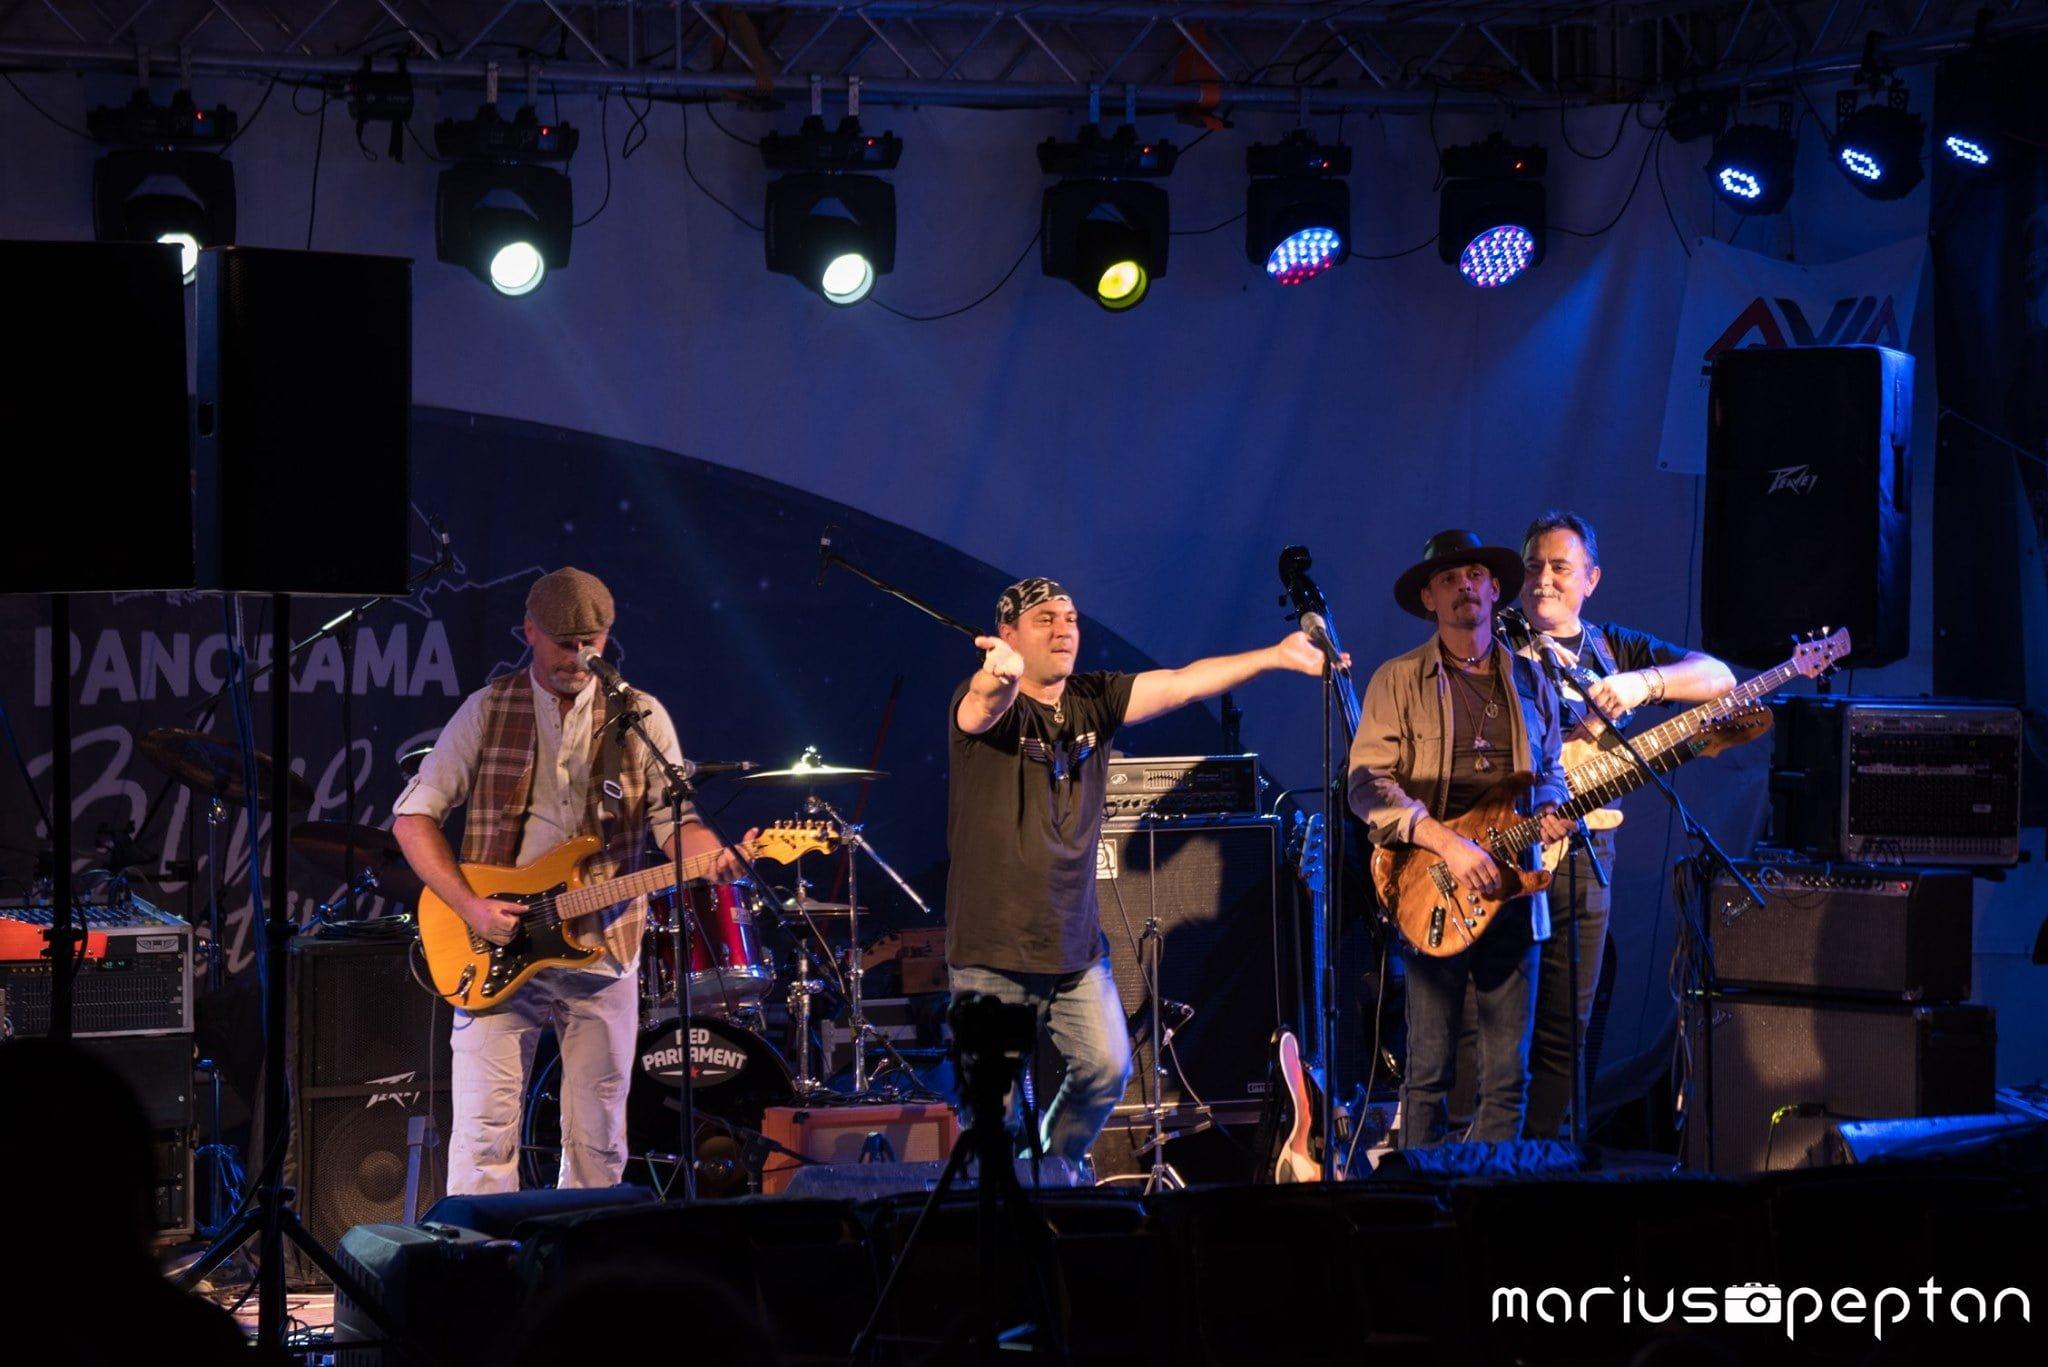 Panorama Blues Festival